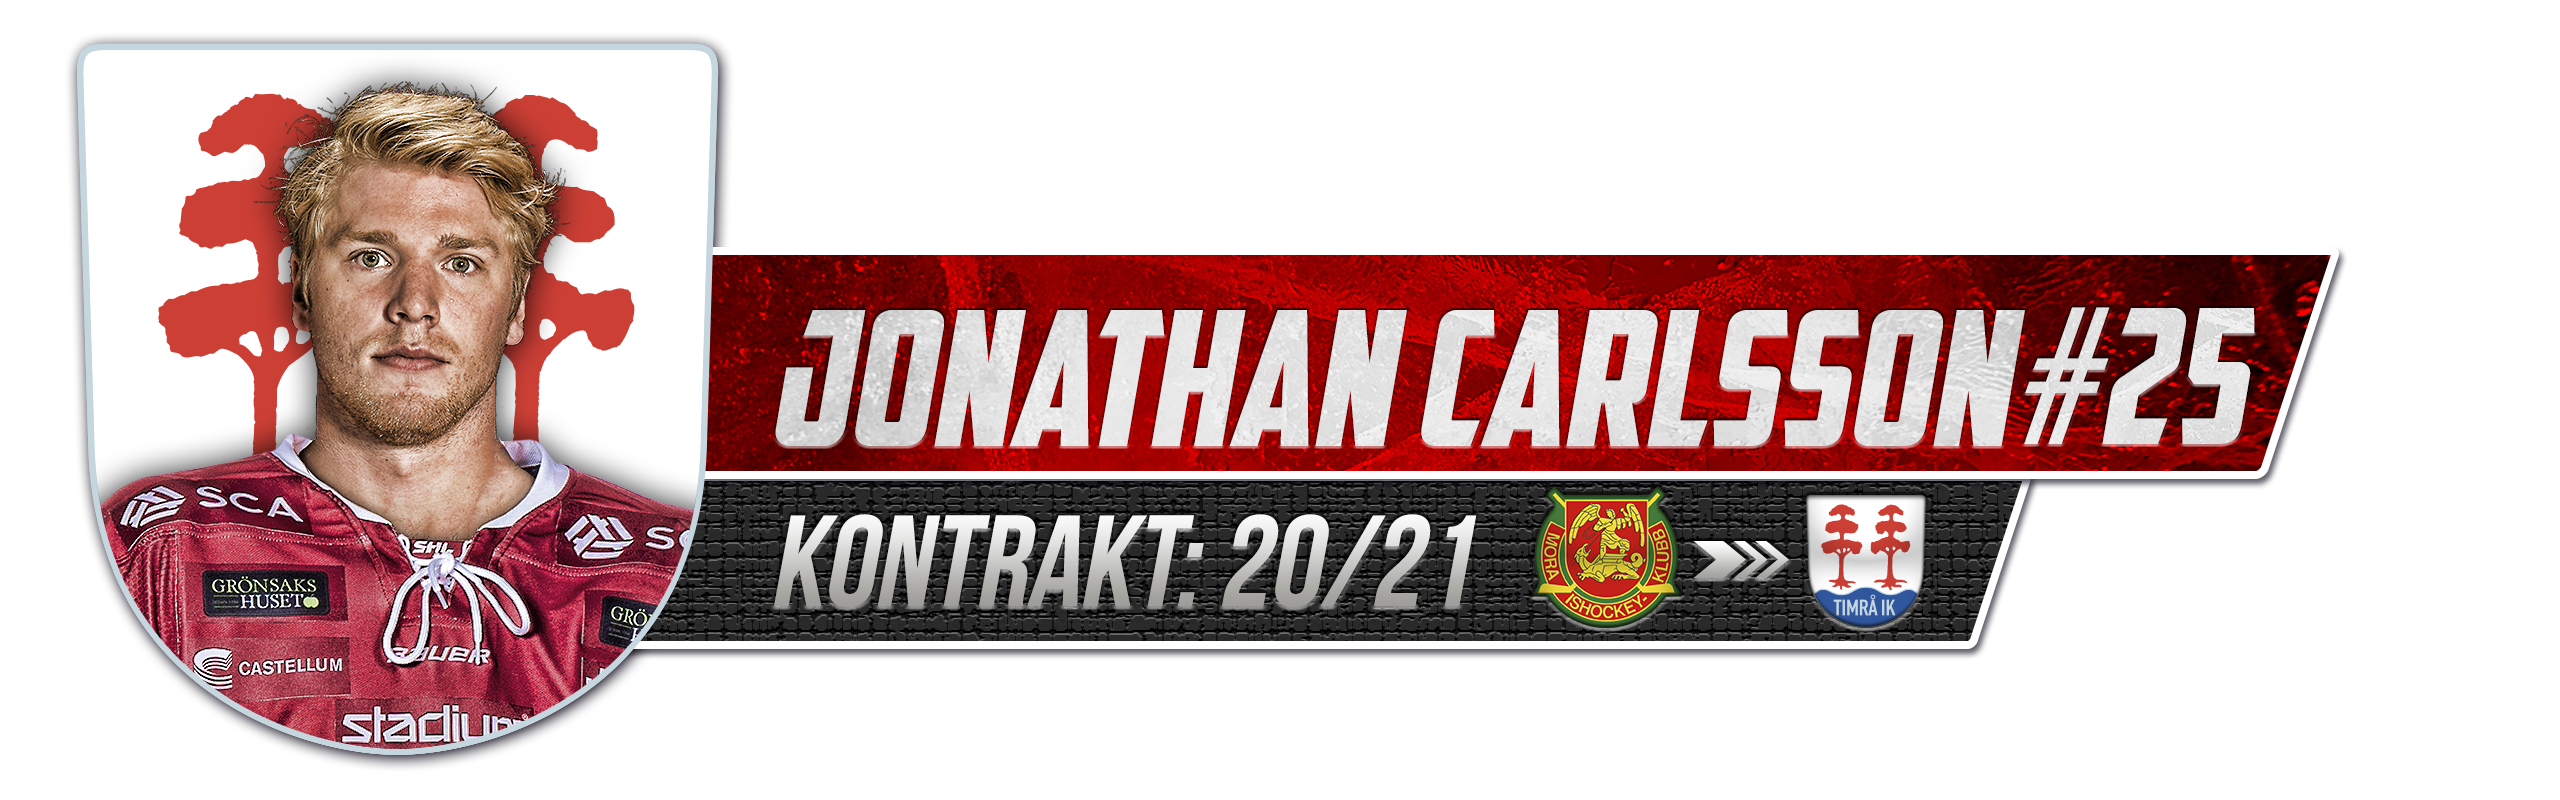 Jonathan Carlsson